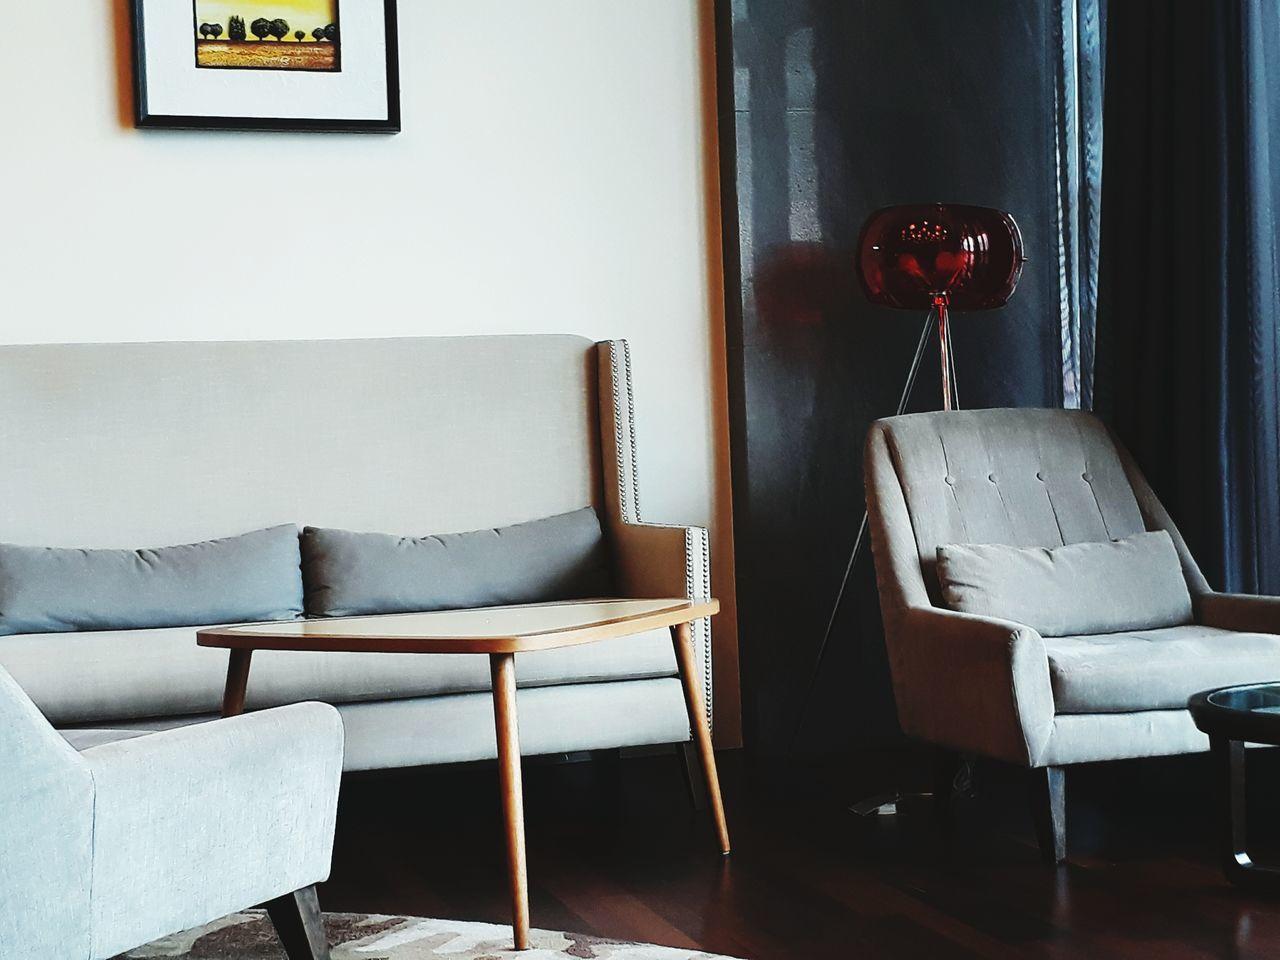 Little Parisian Feel perhaps? Home Showcase Interior Living Room Home Interior Chair Indoors